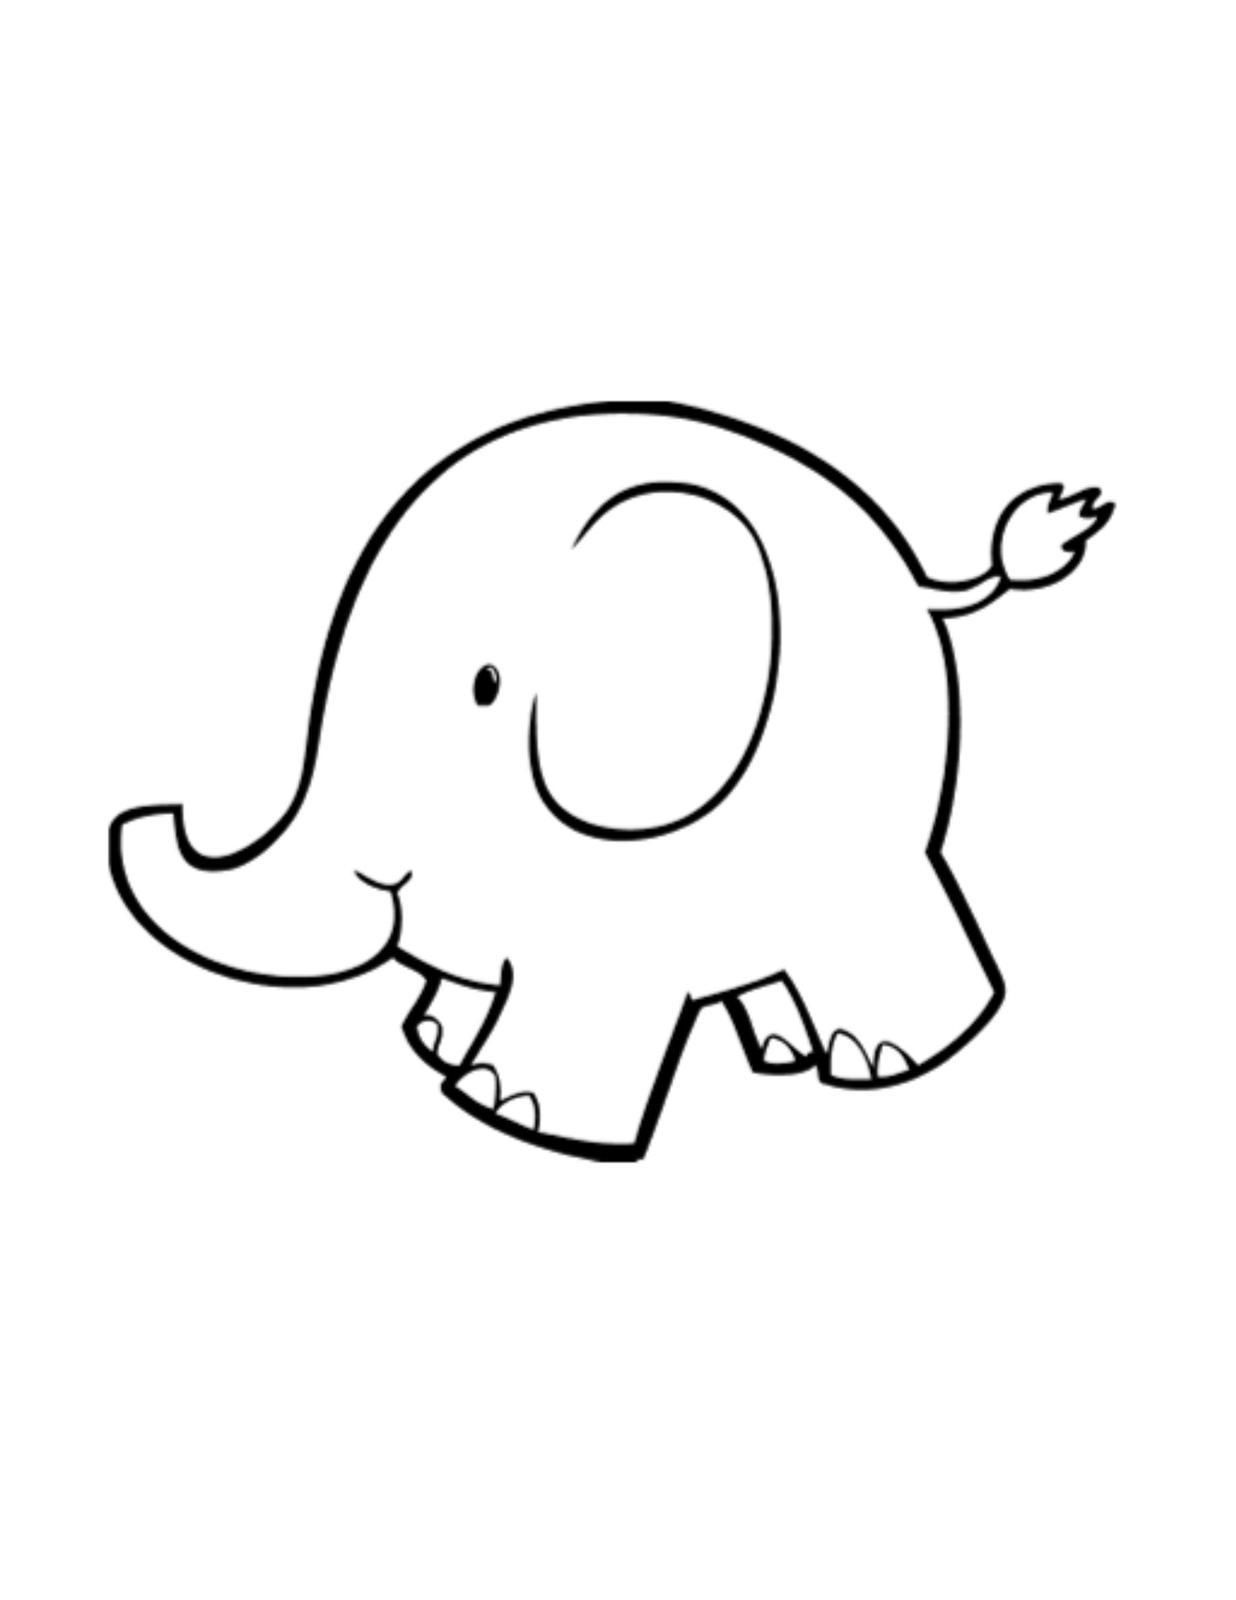 1236x1600 Baby Elephant Outline.jpg